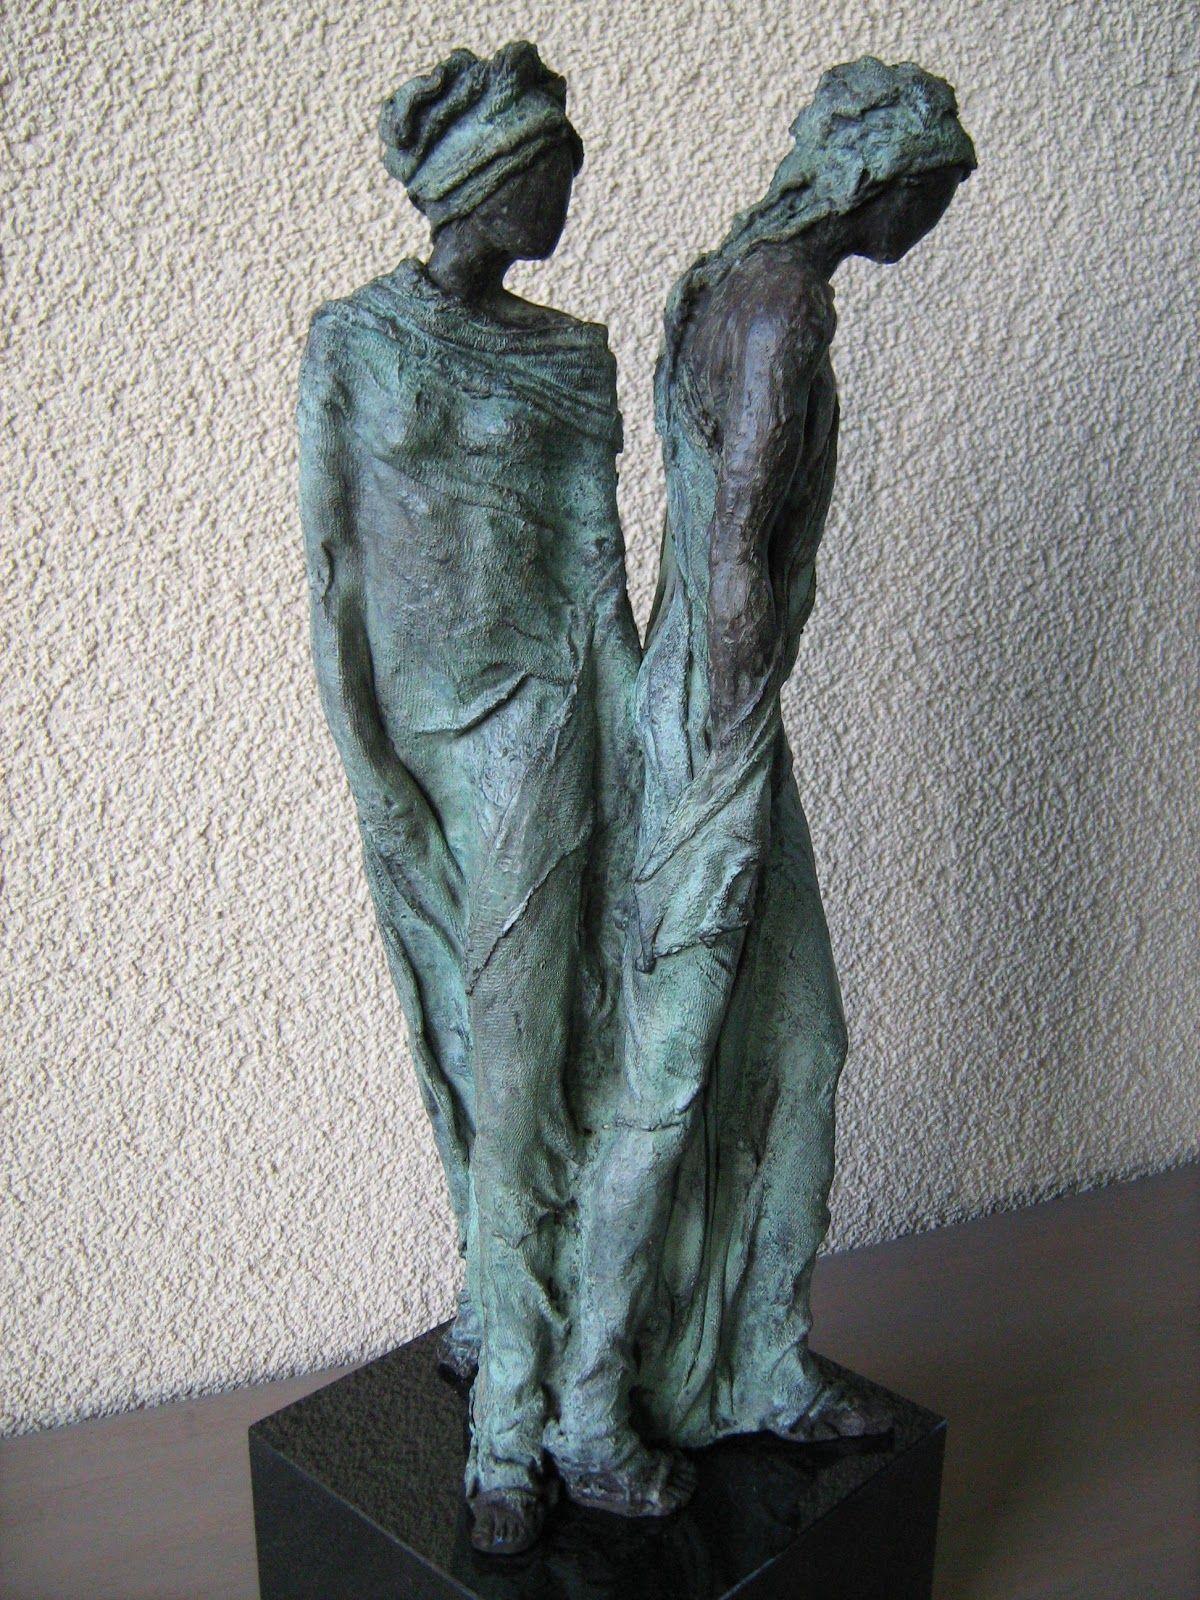 Kieta Nuij (Holland)